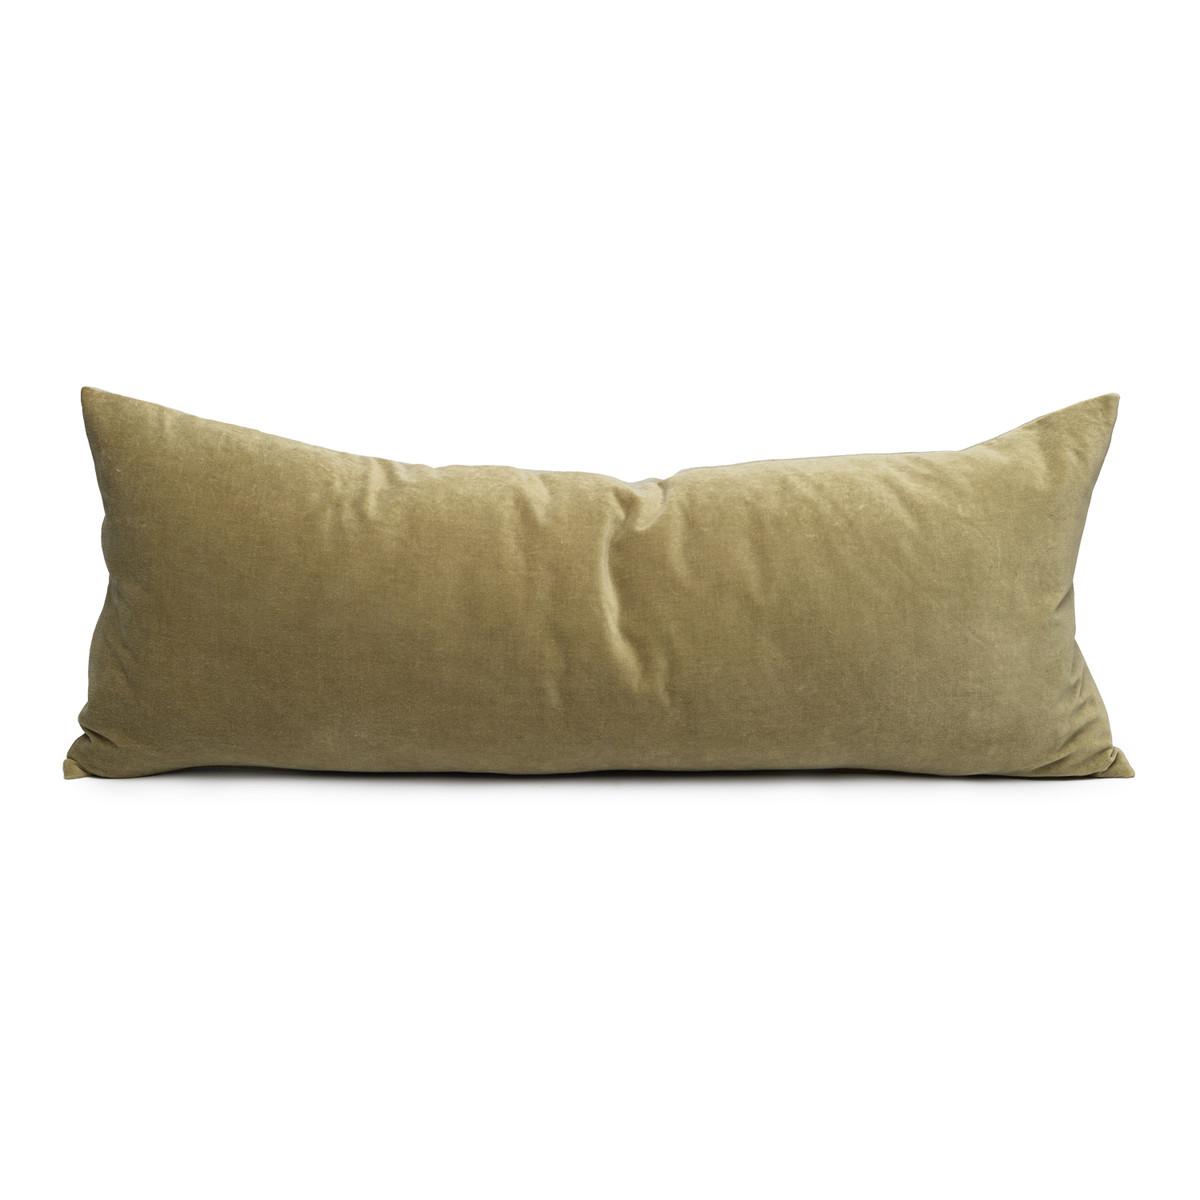 Palais Jade Velvet Lumbar Pillow - Front